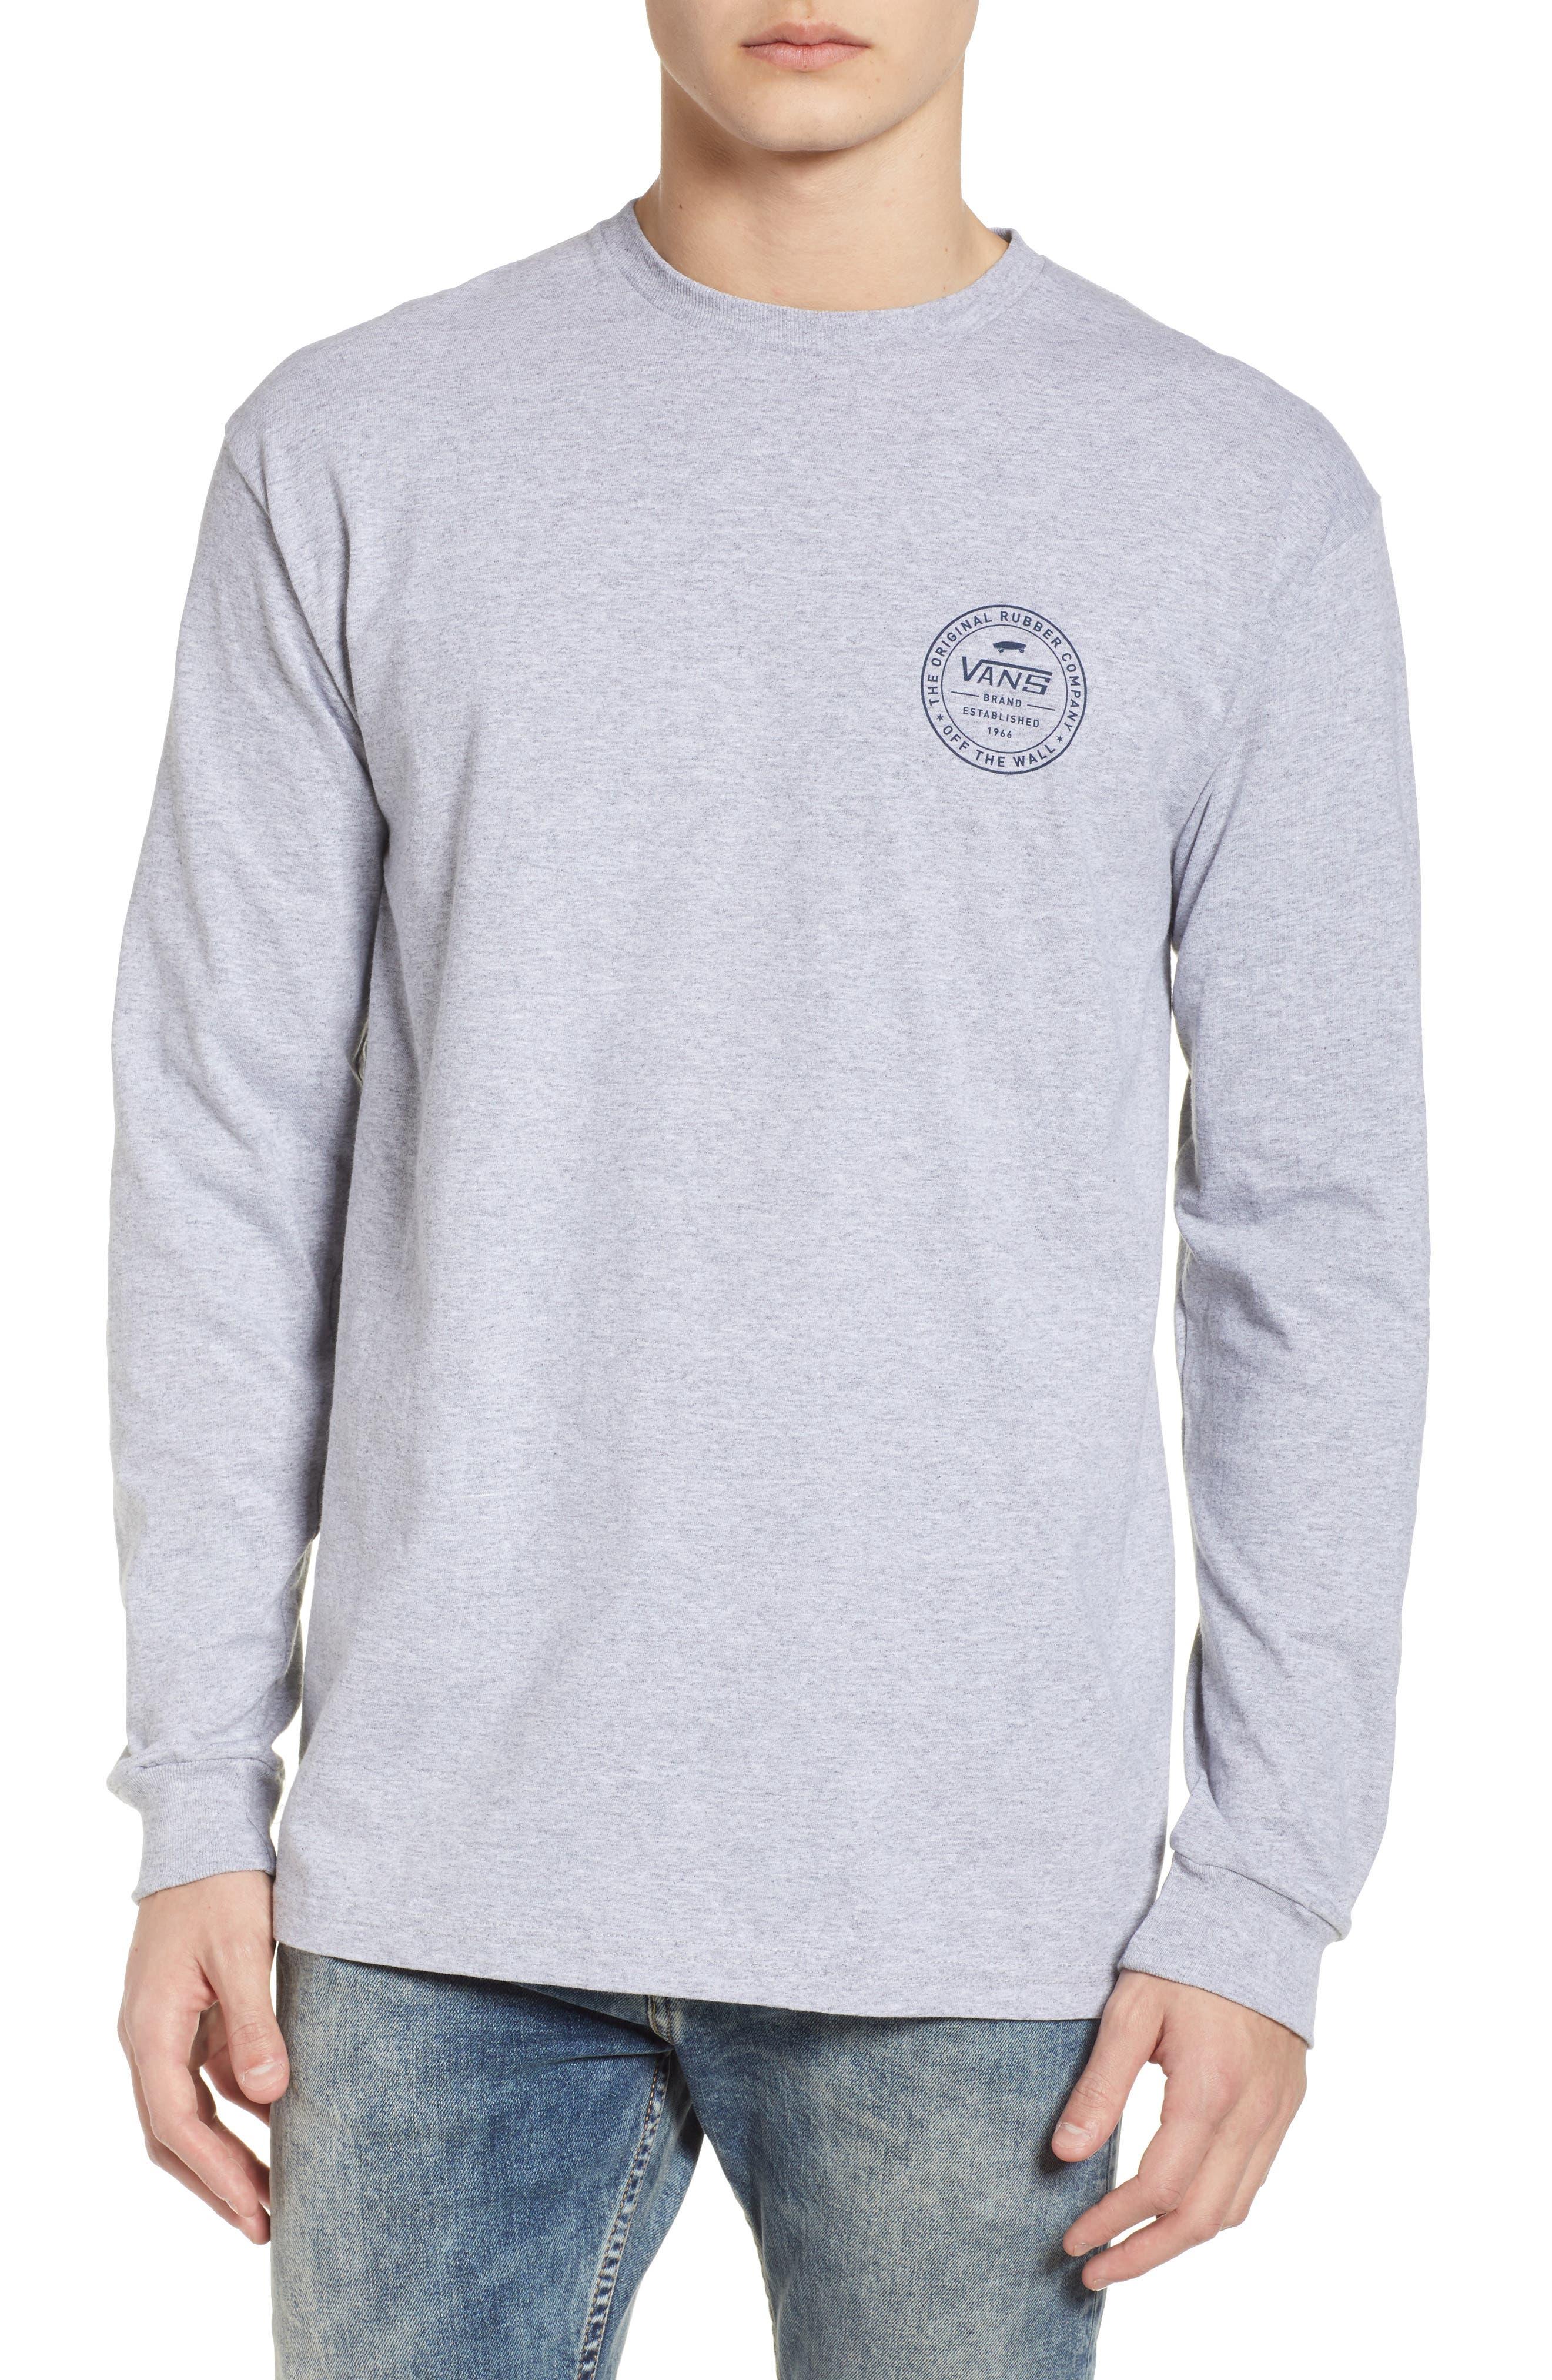 Established '66 Graphic T-Shirt,                             Main thumbnail 1, color,                             Grey